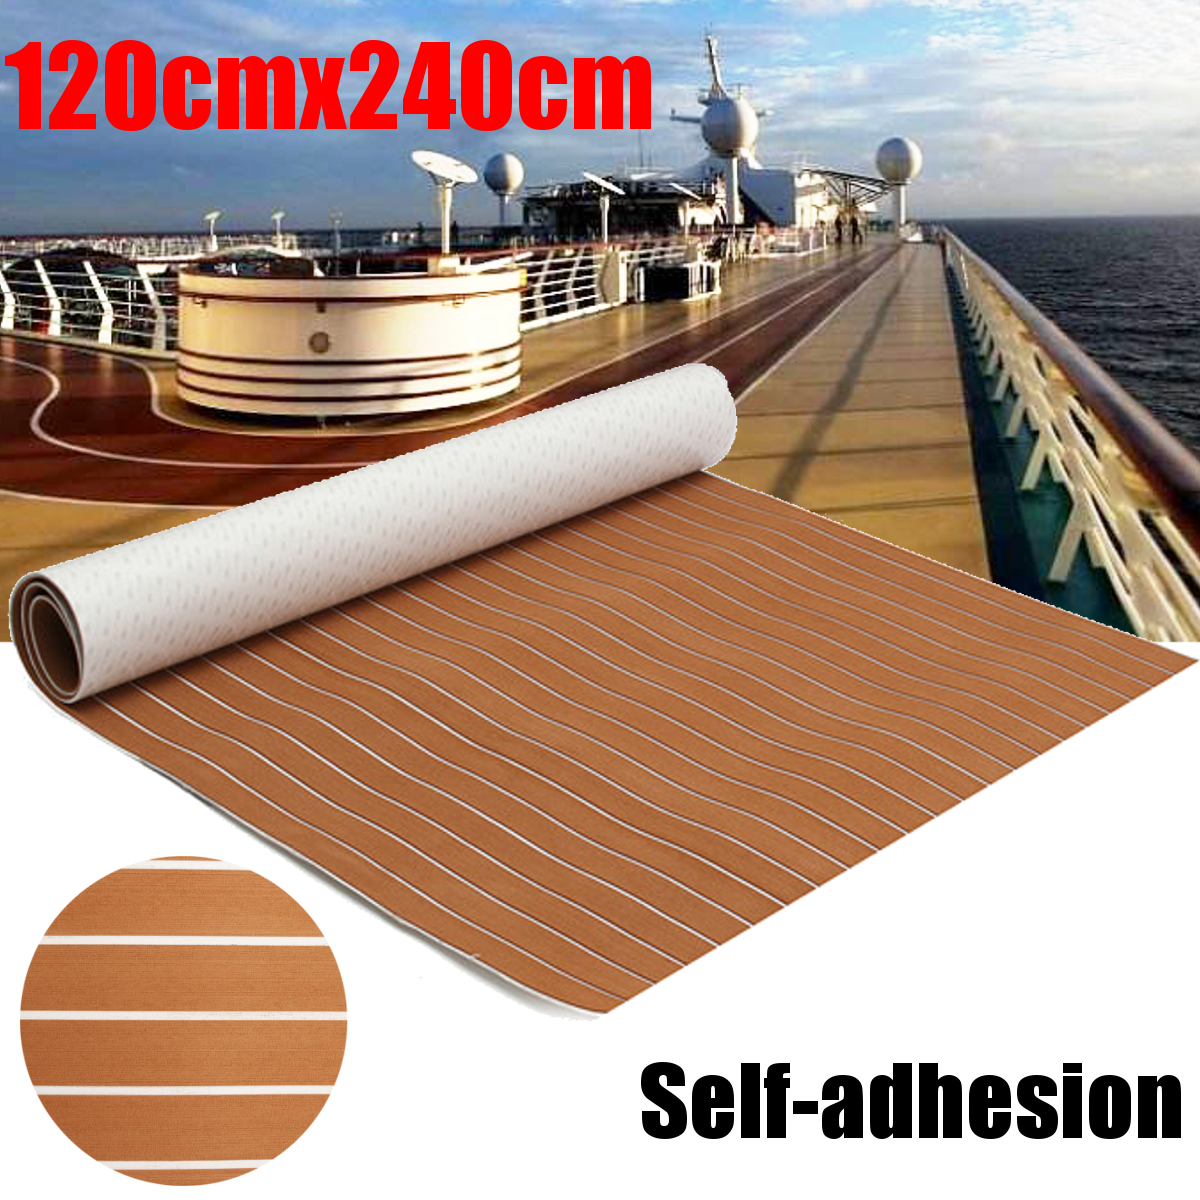 1200x2400x5mm Self Adhesive EVA Foam Teak Sheet Teak Flooring Teak Boat Decking Marine Car Yacht Floor Mat Synthetic Teak Pad колонки tannoy autograph mini teak